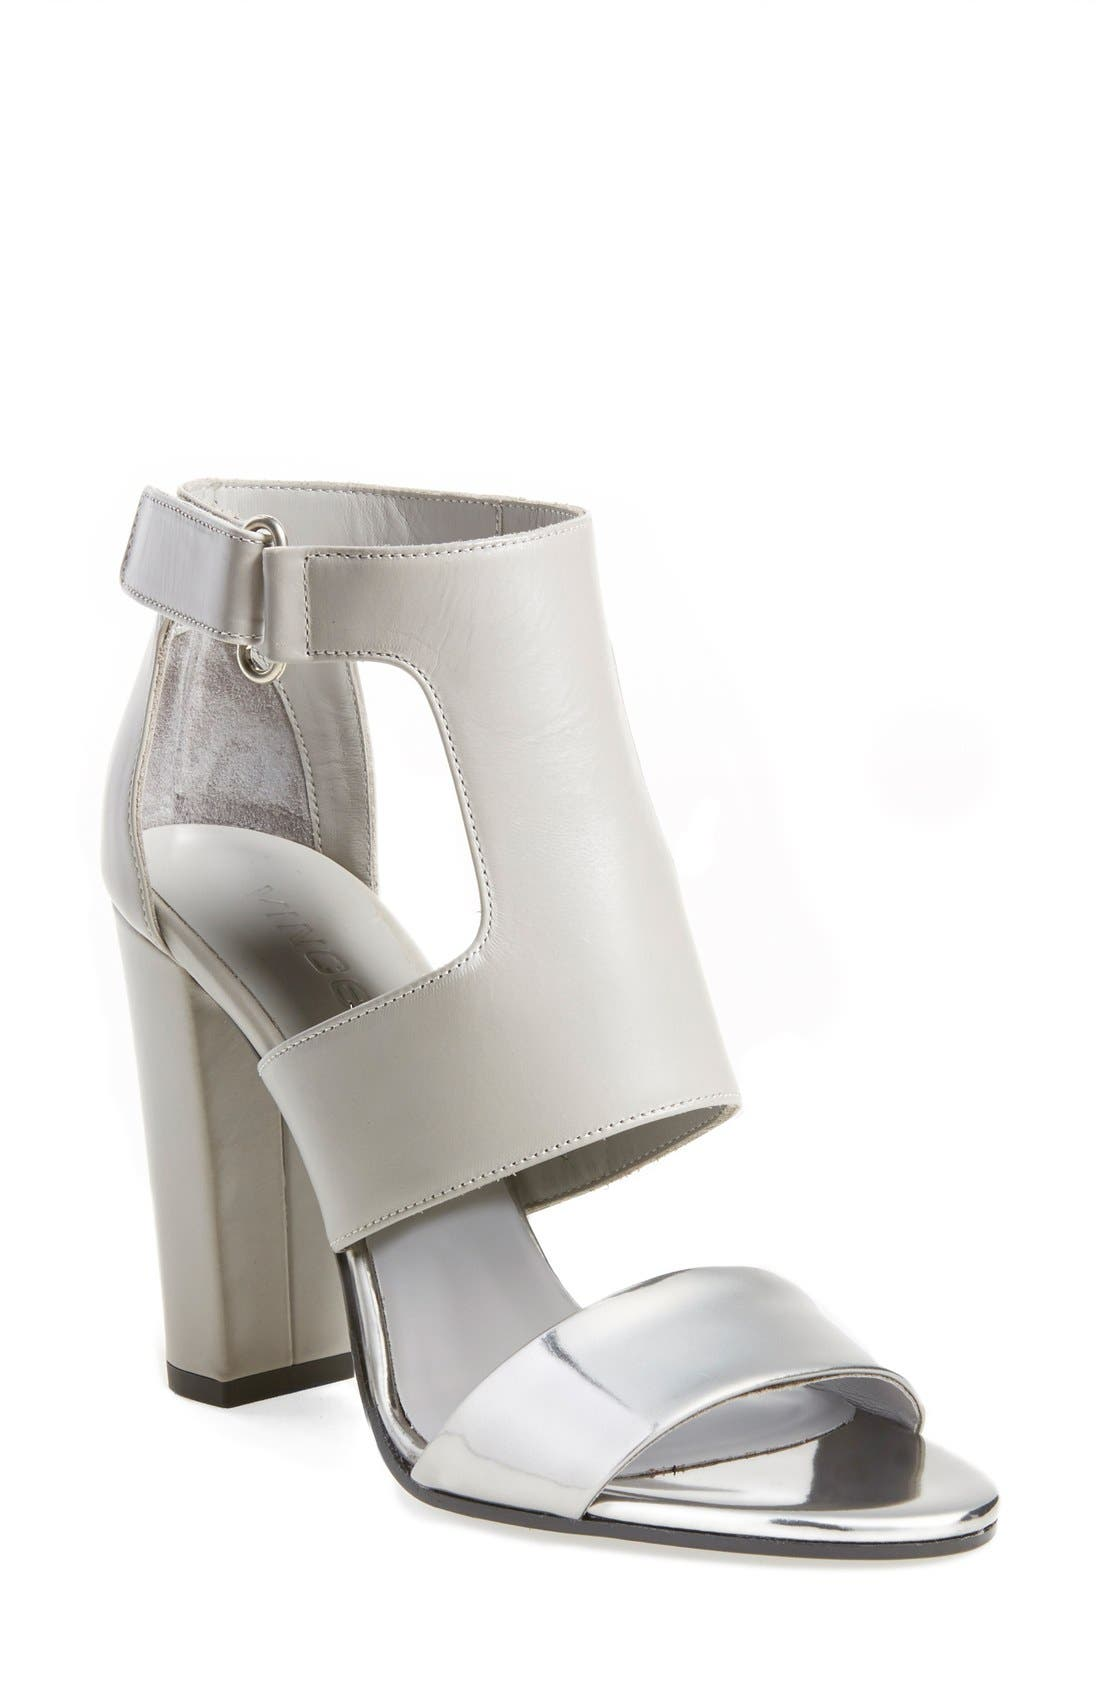 Main Image - Vince 'Aretha' Colorblock Sandal (Women)